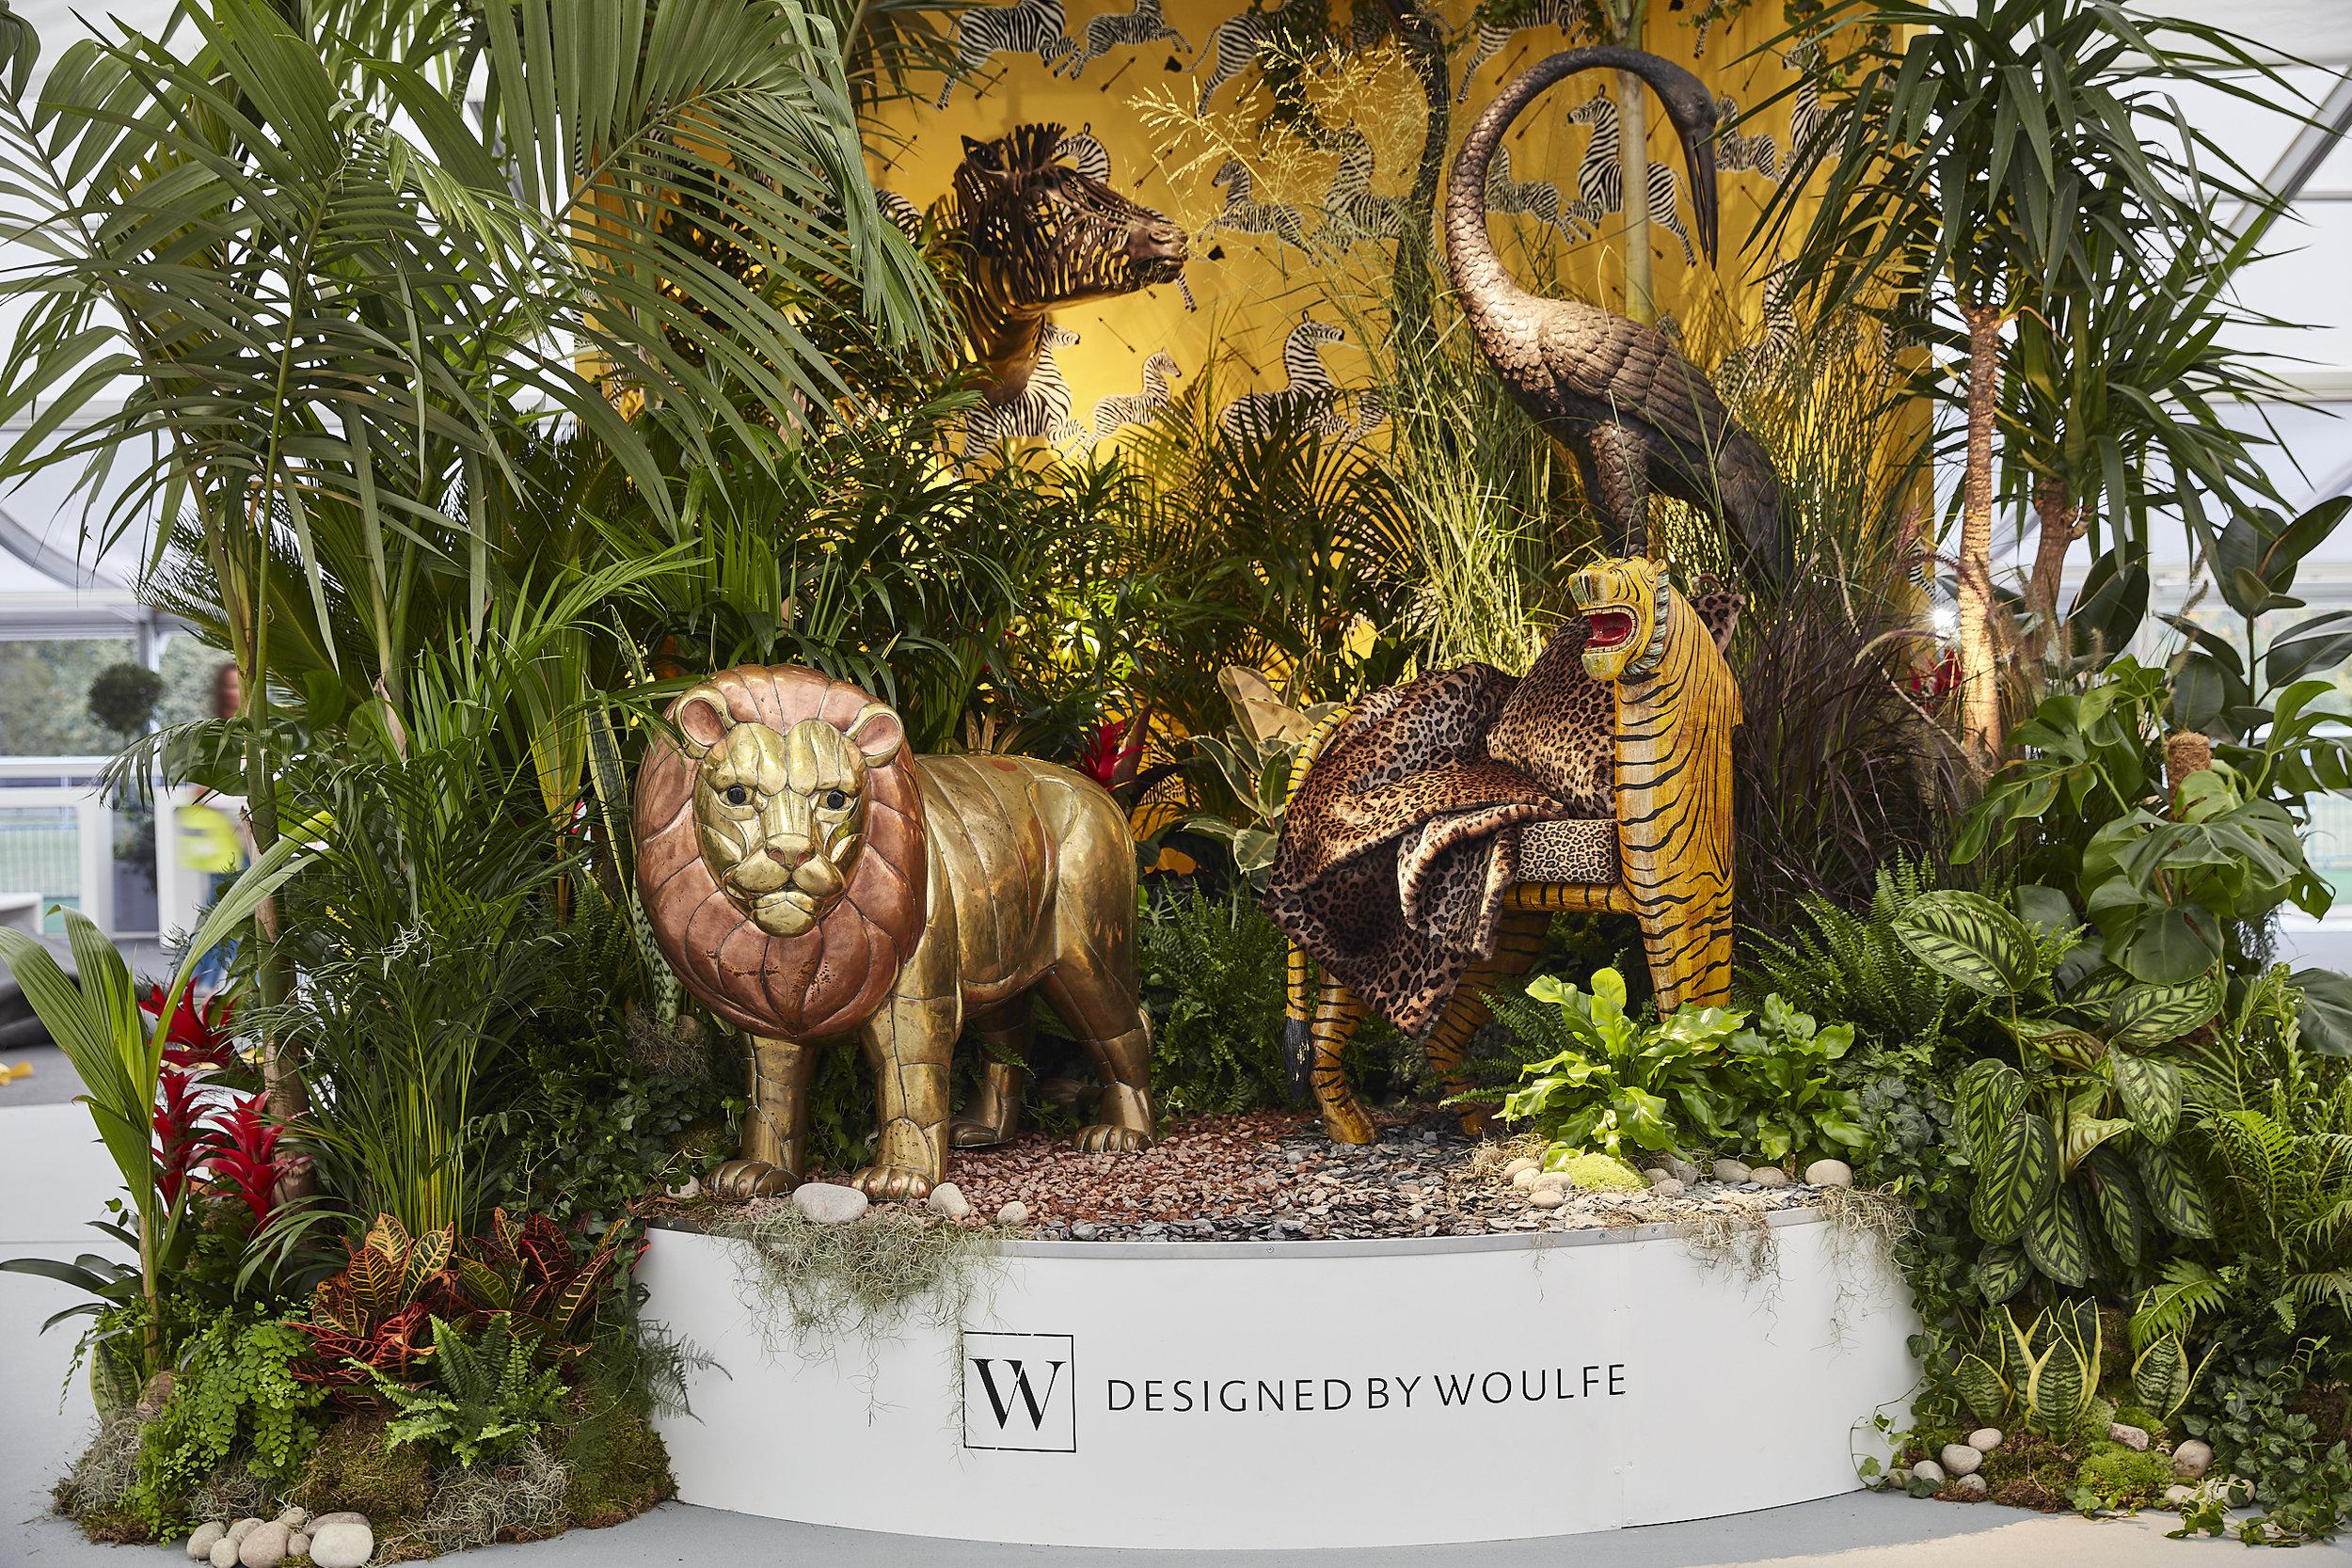 Designed by Woulfe, Decorex Entrance 2018